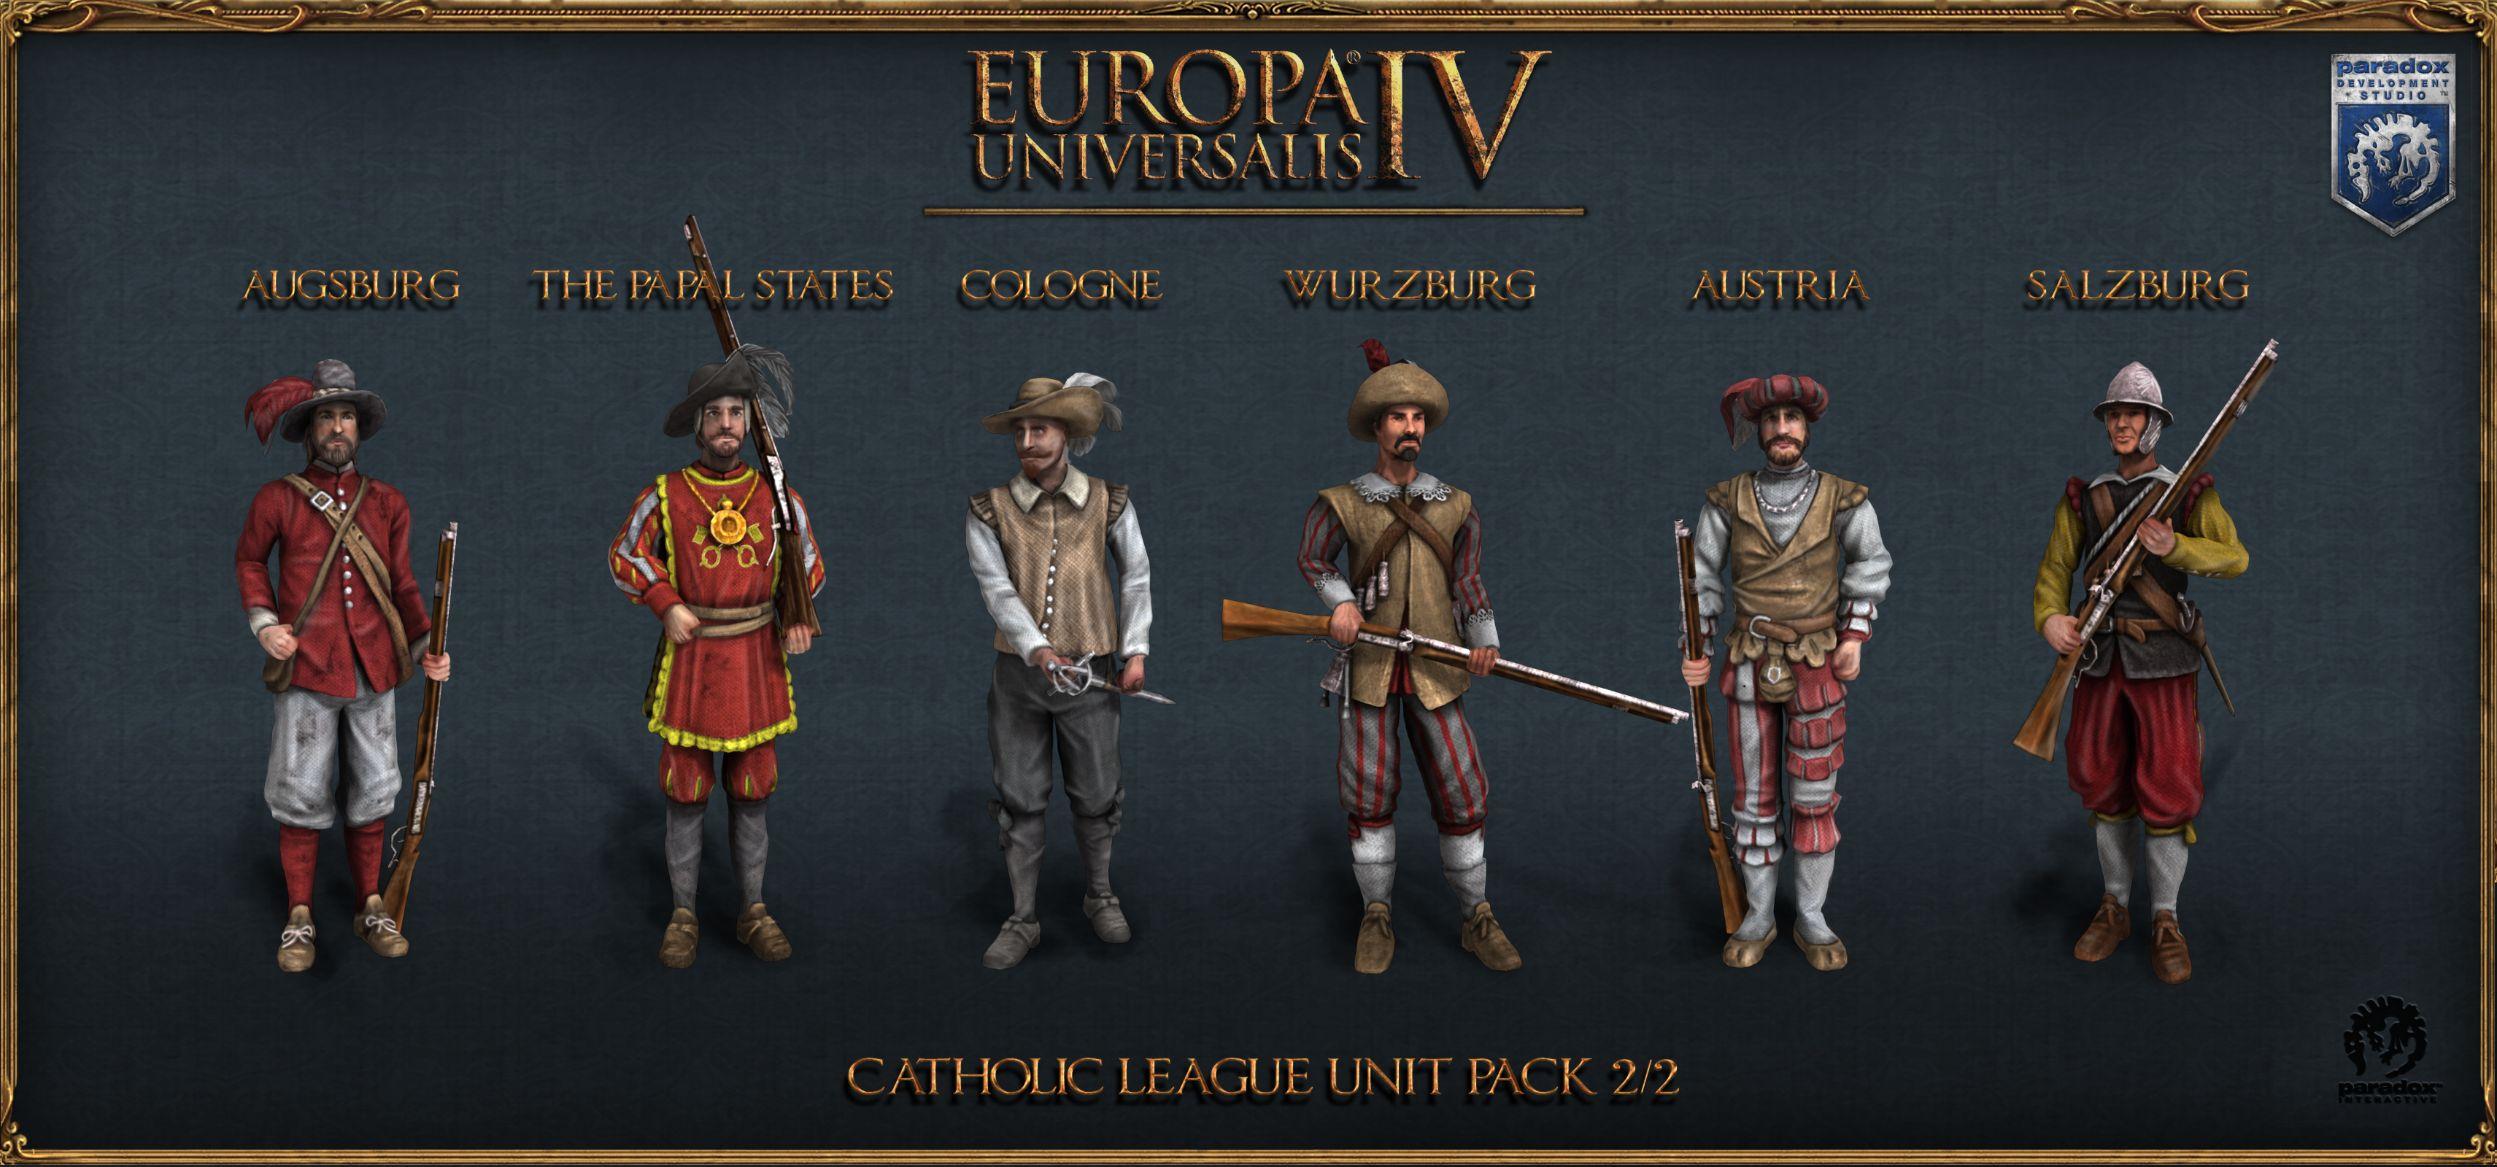 Europa Universalis IV: Catholic League Unit Pack | ROW (2e323077-b2cf-4fd3-a6a8-eaee0ed2574e)